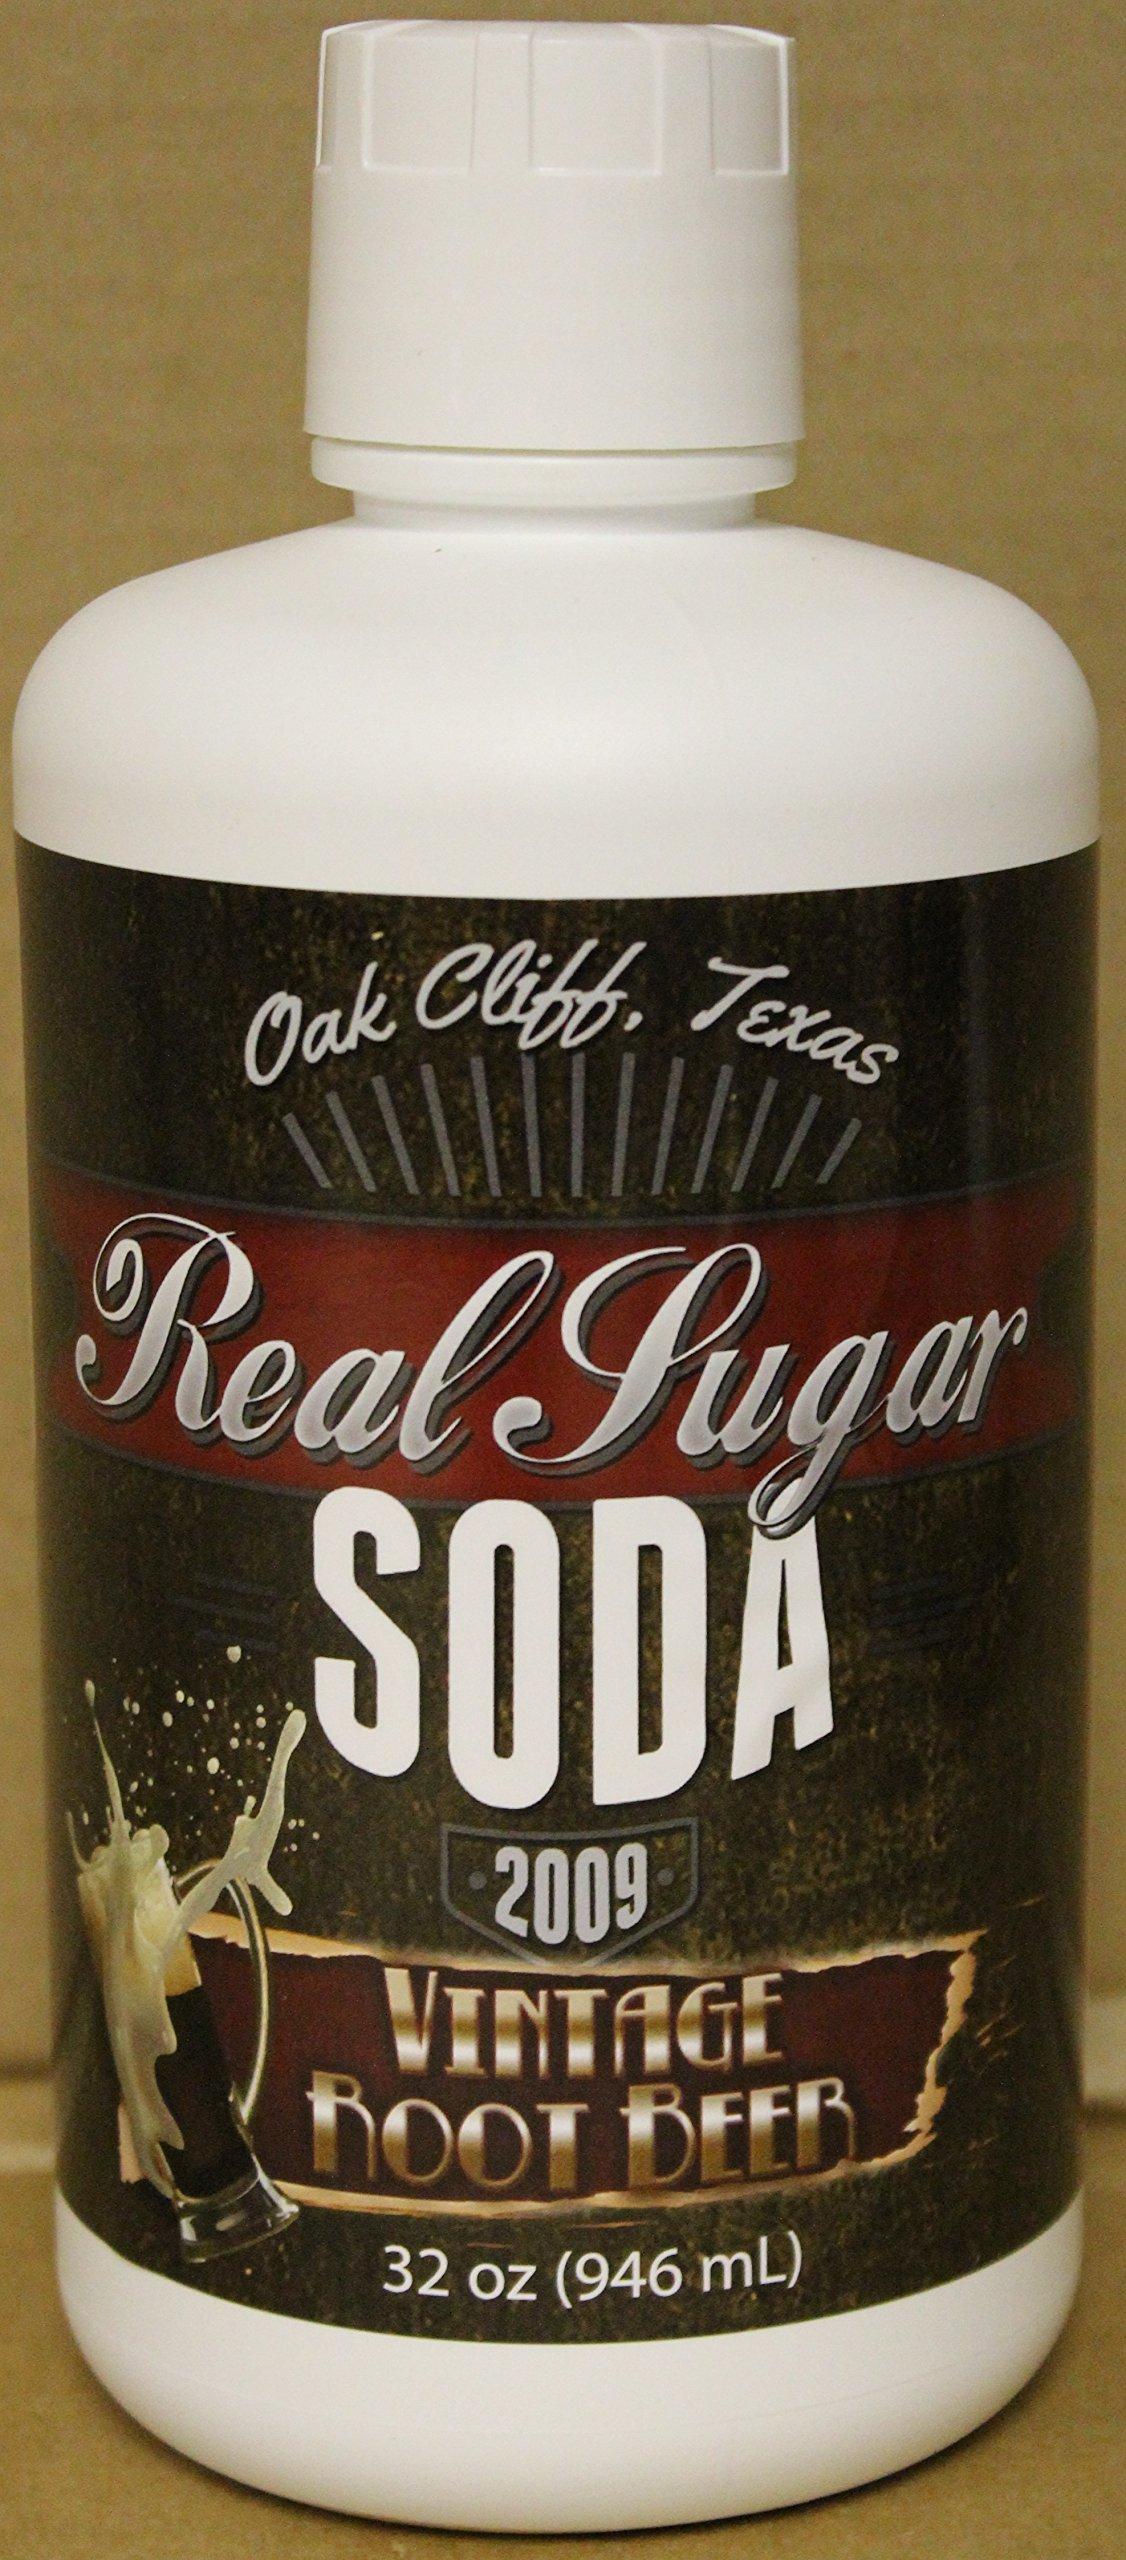 Vintage Root Beer Cane Sugar Soda Syrup 4 Pack by Real Sugar Soda